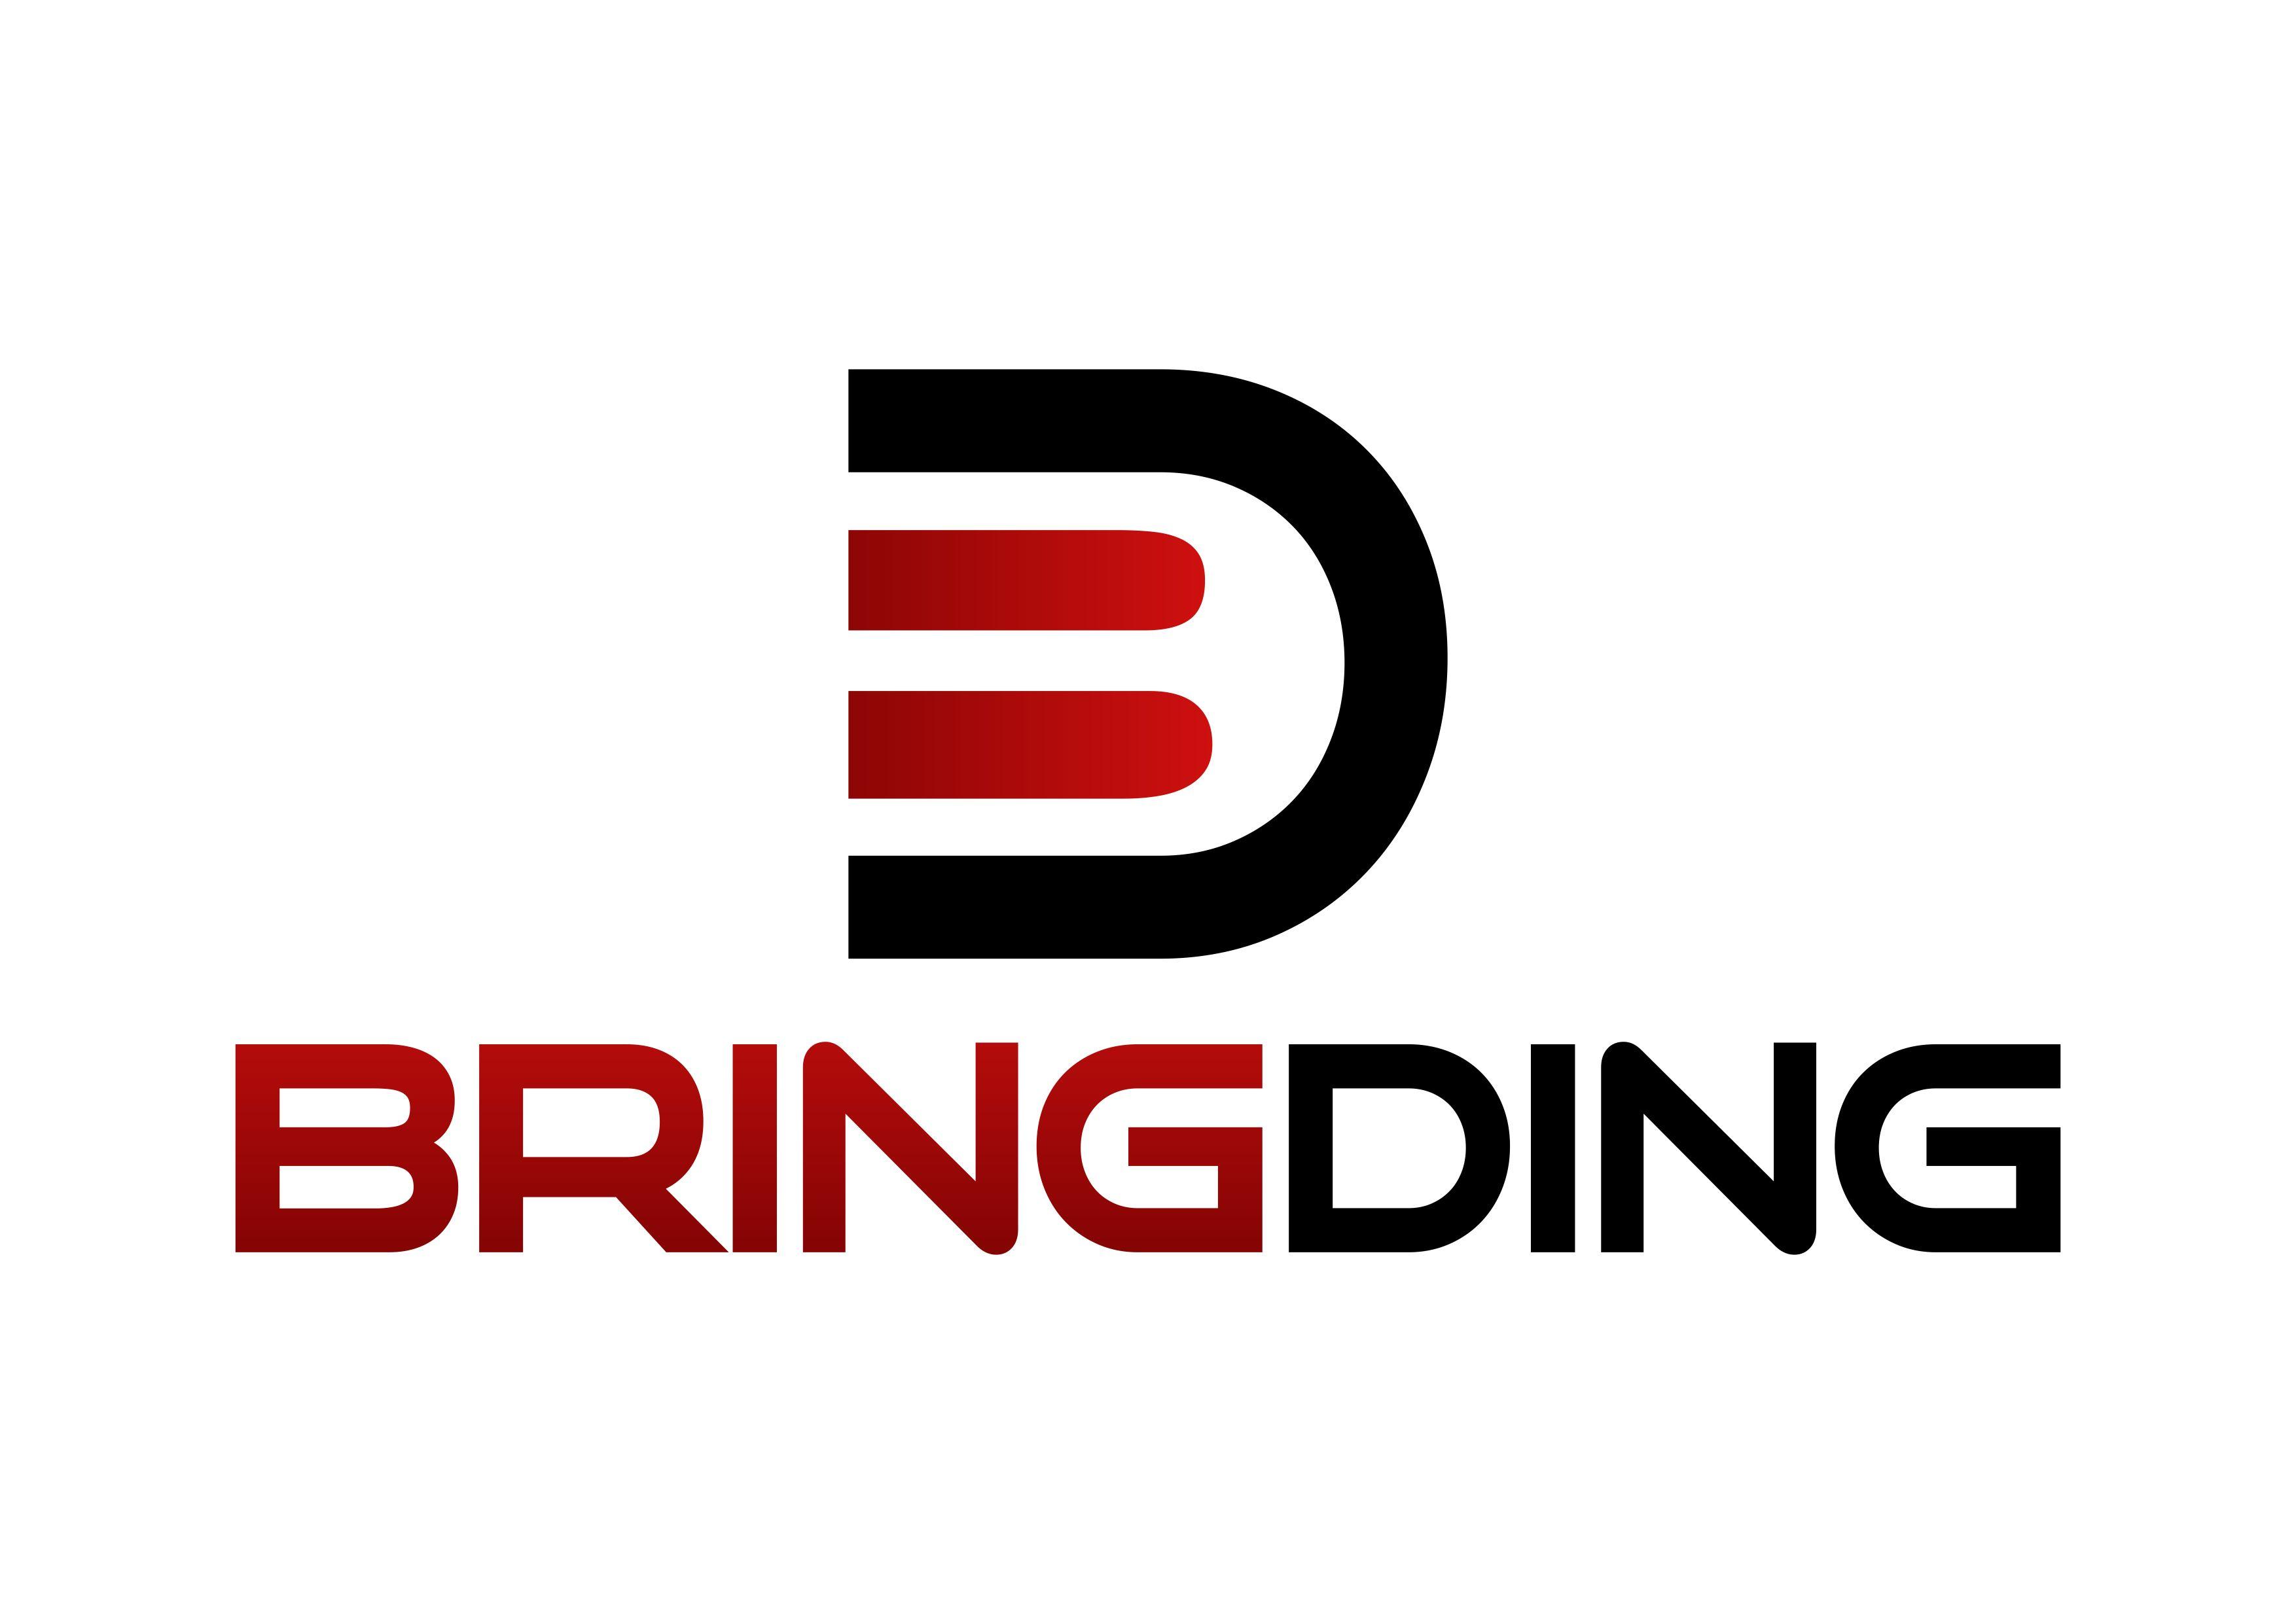 bringding GmbH